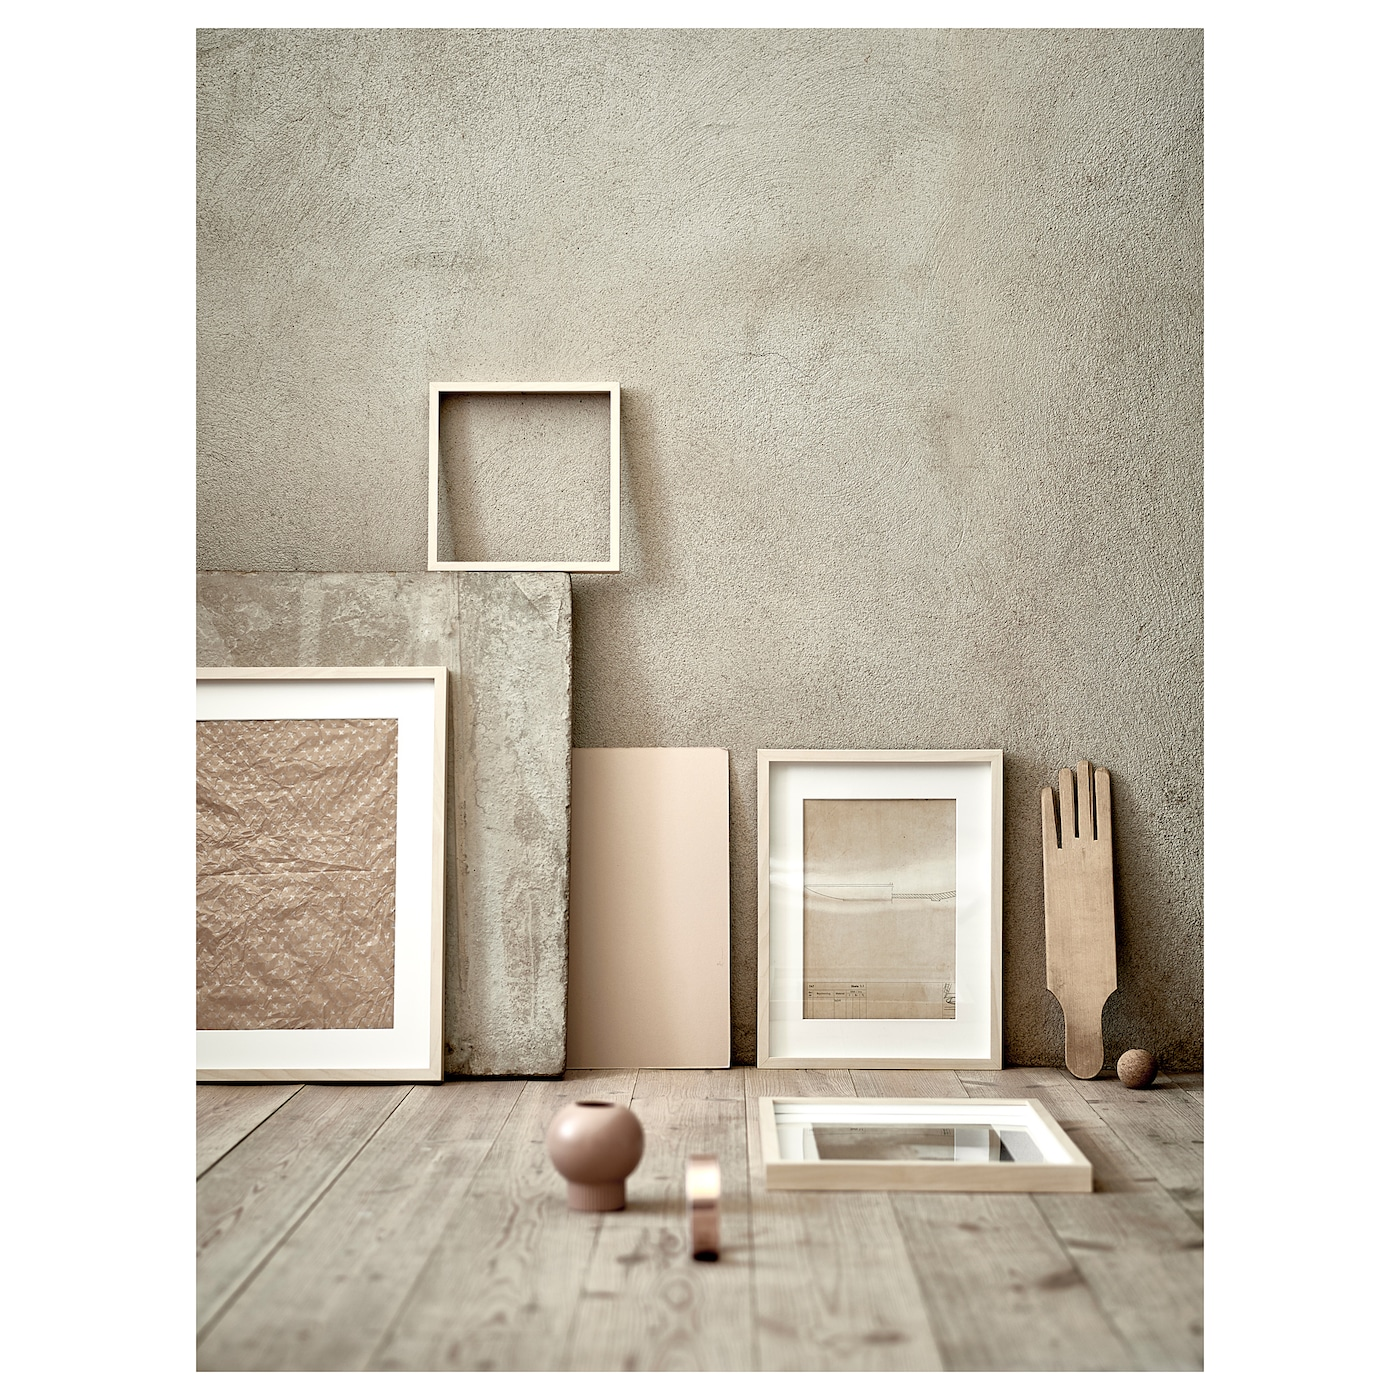 accroche cadre photo good fiskbo cadre with accroche. Black Bedroom Furniture Sets. Home Design Ideas